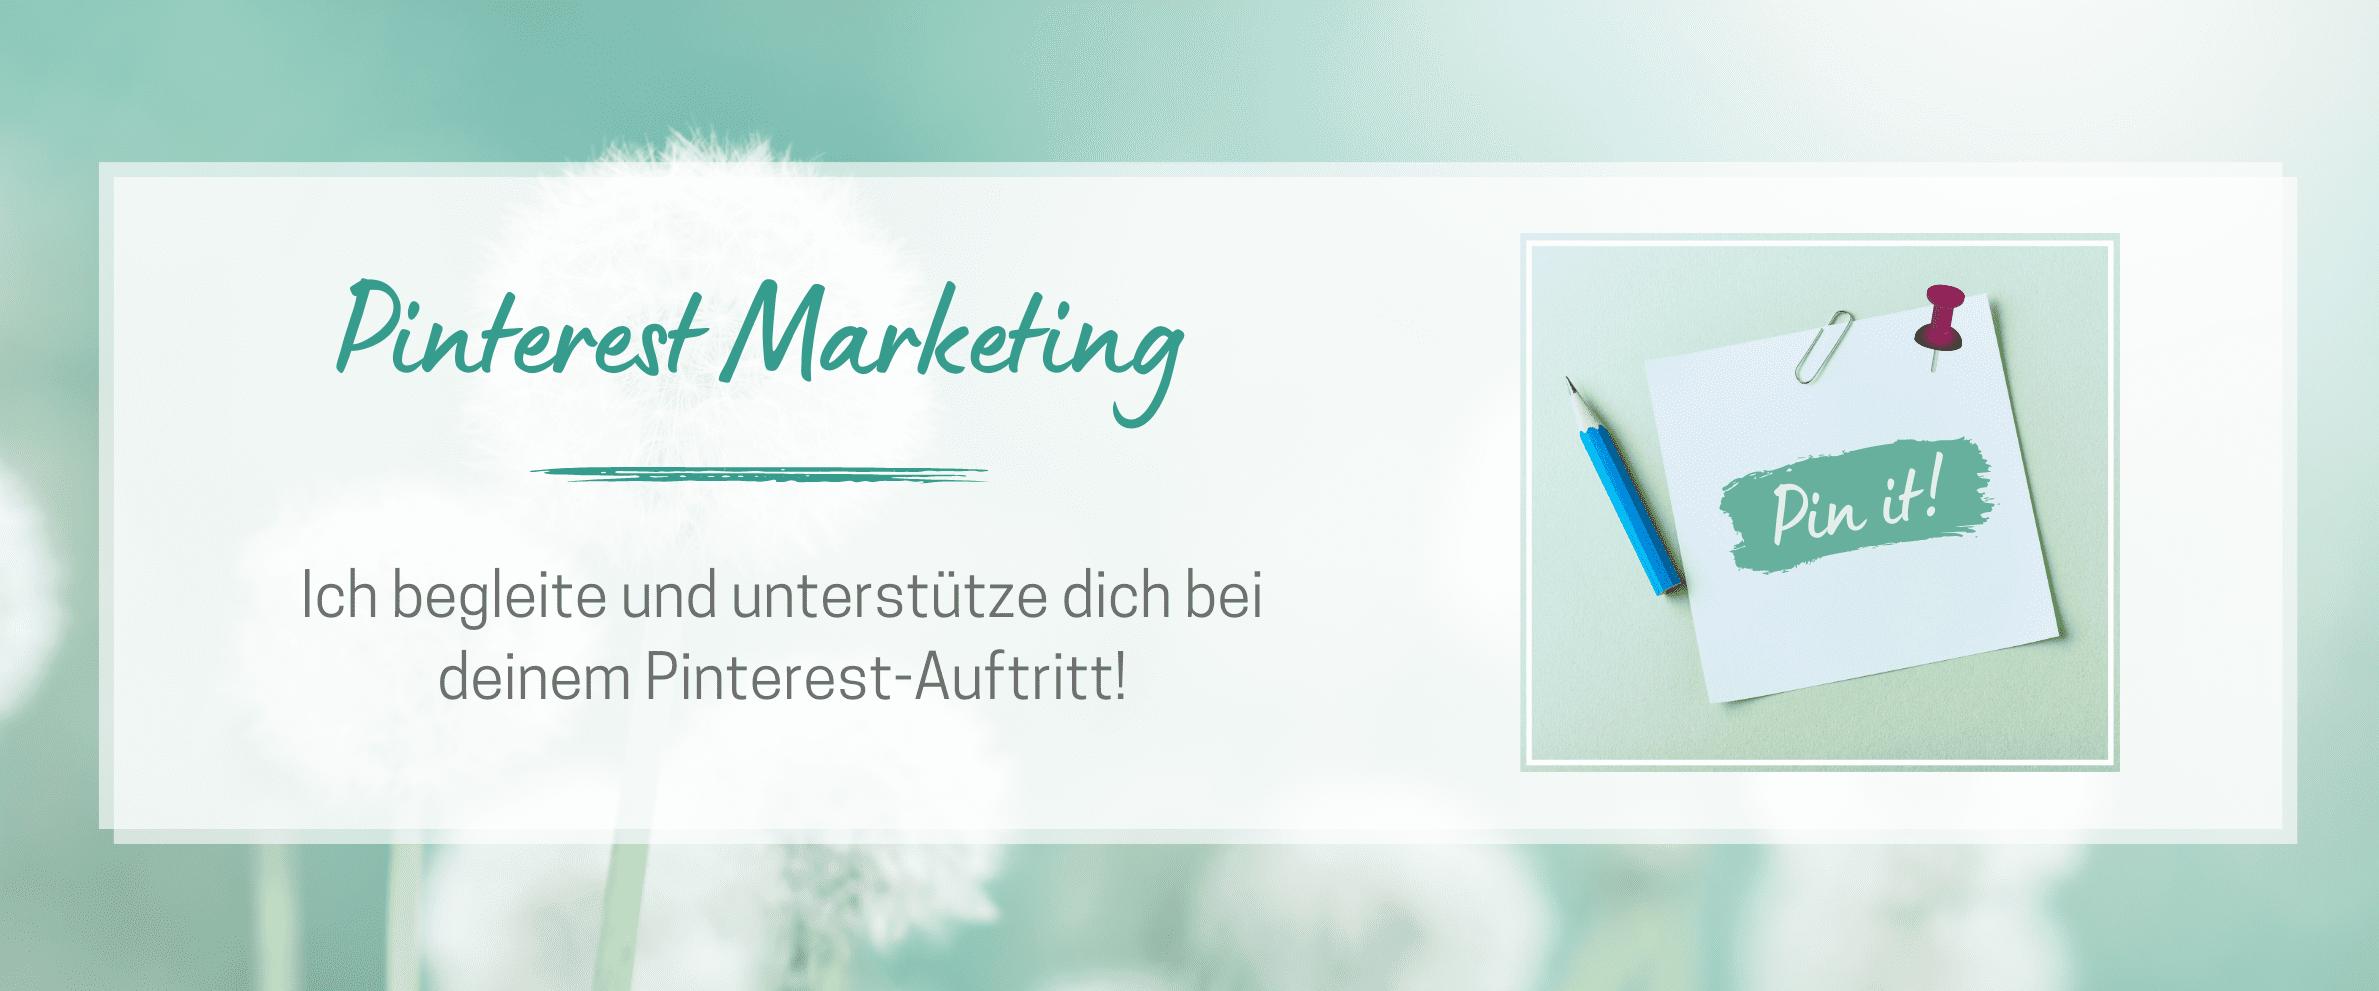 Pinterest Marketing Cindy Weyl